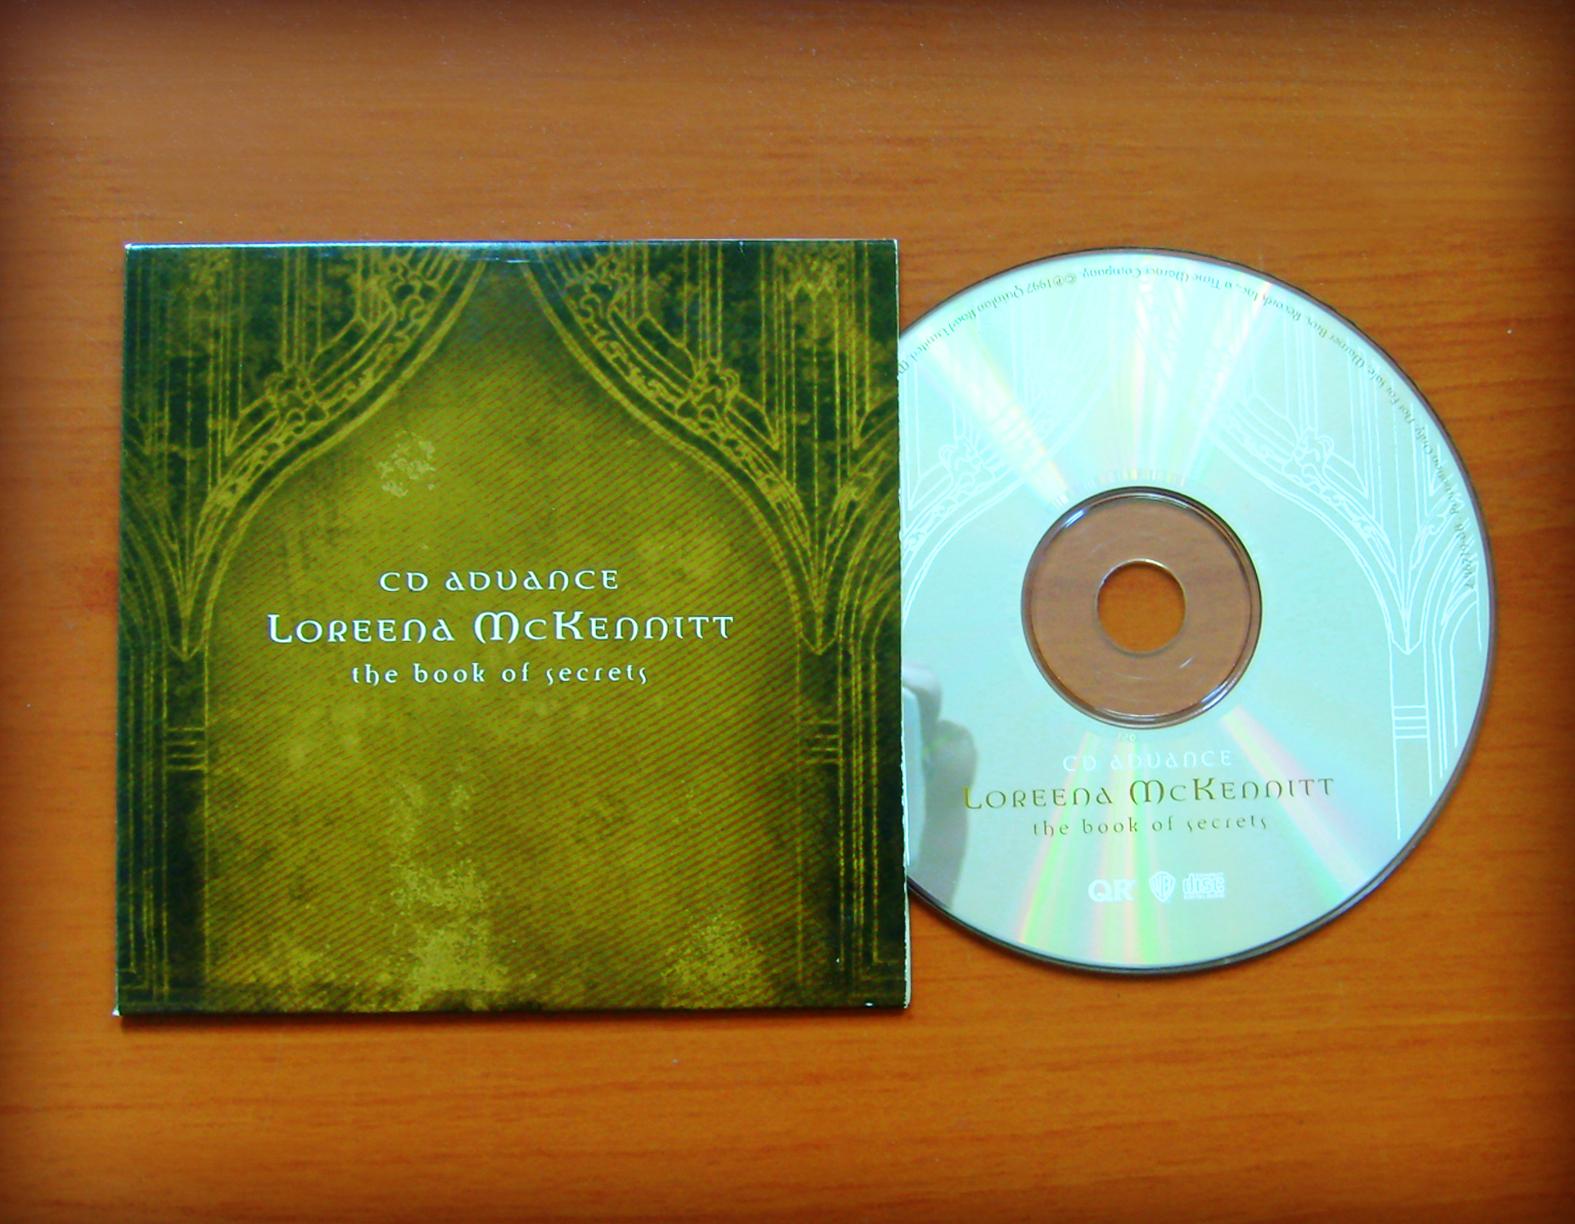 loreena mckennitt collection 1997 the book of secrets cd advance